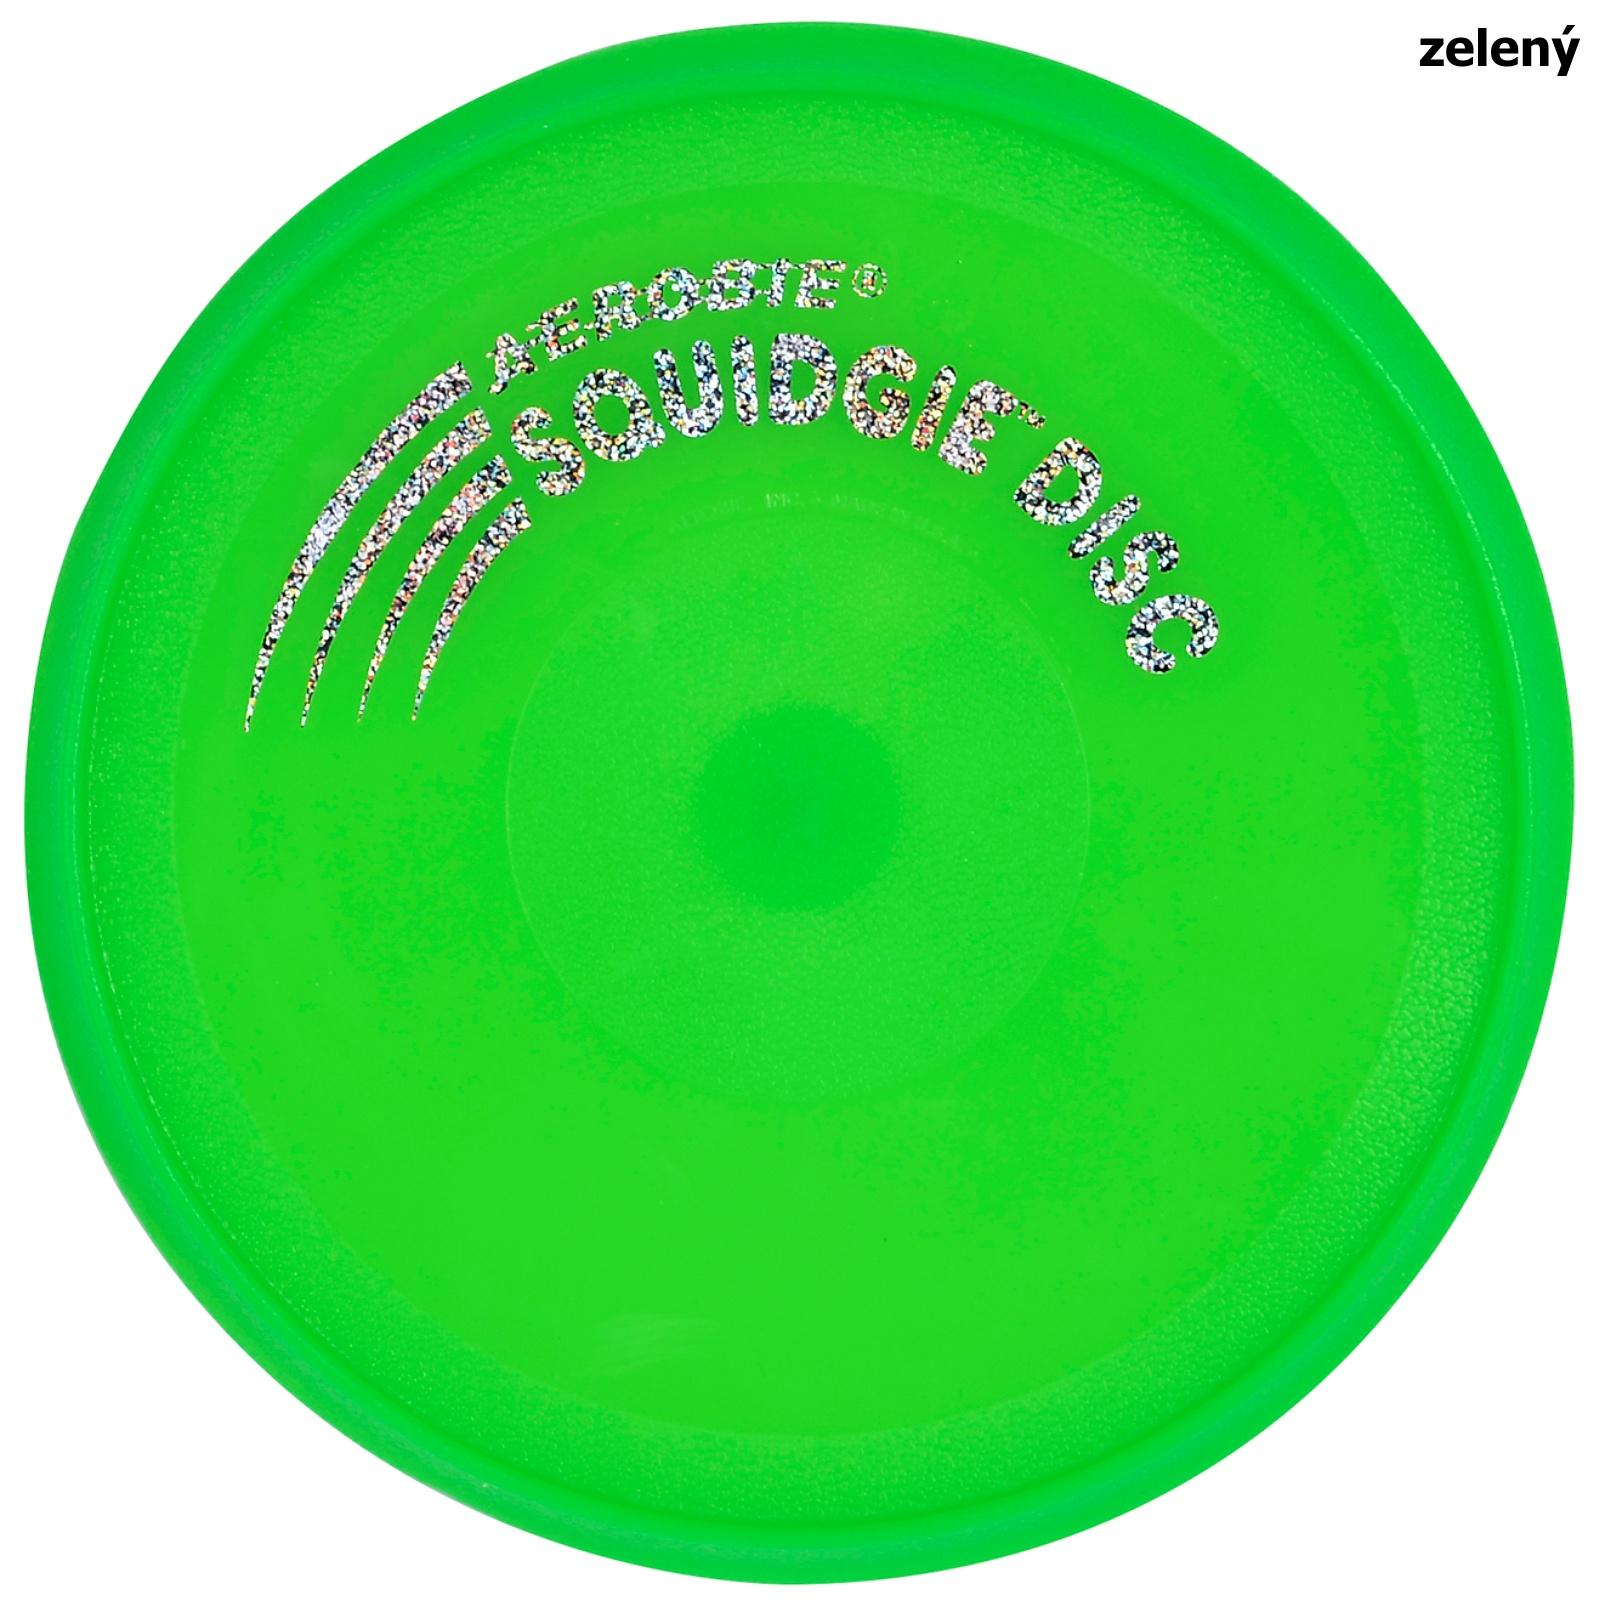 Frisbee - lietajúce taniere